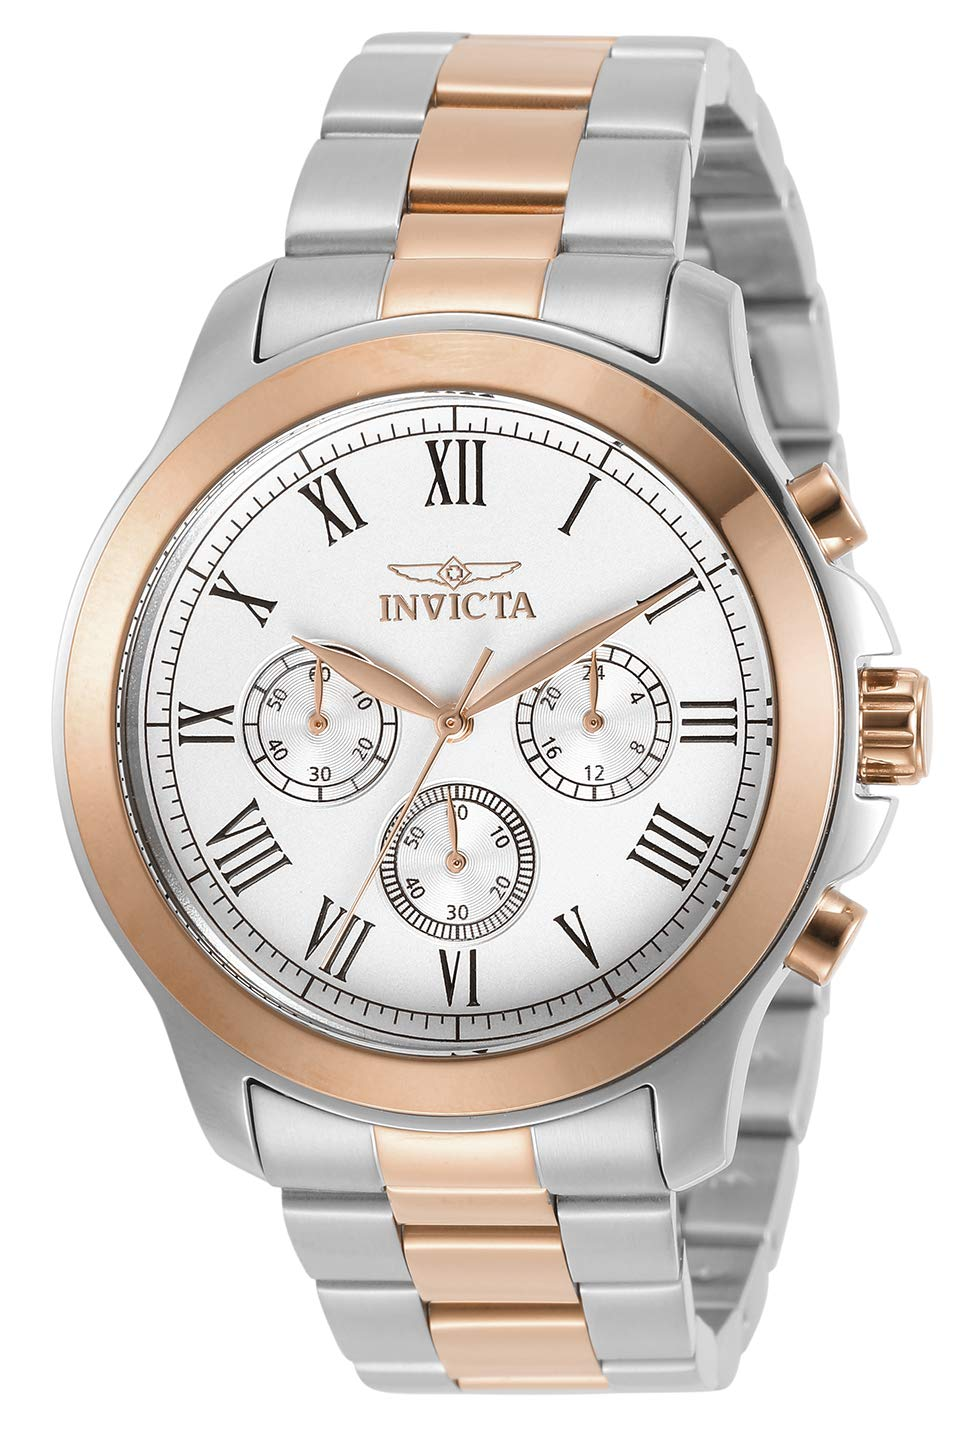 Invicta Men's 21660 Specialty Analog Display Swiss Quartz Two Tone Watch